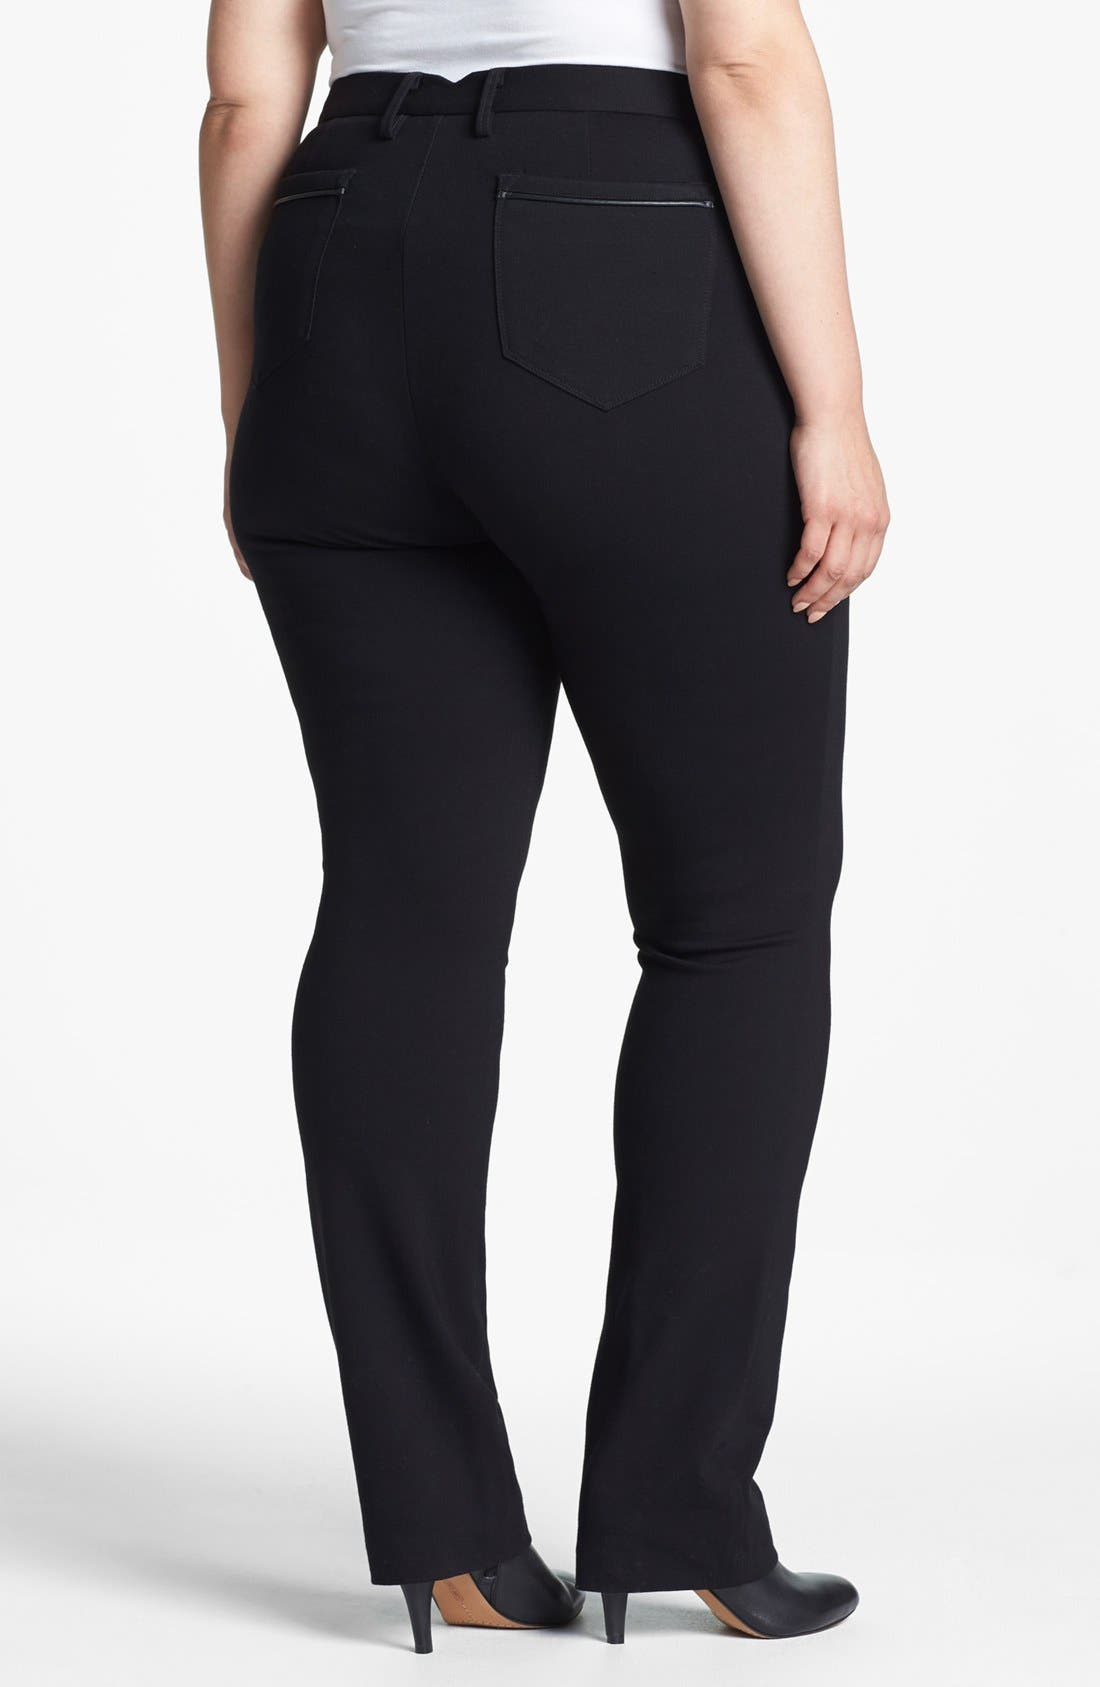 Alternate Image 2  - NYDJ Faux Leather Trim Stretch Ponte Pants (Plus Size)